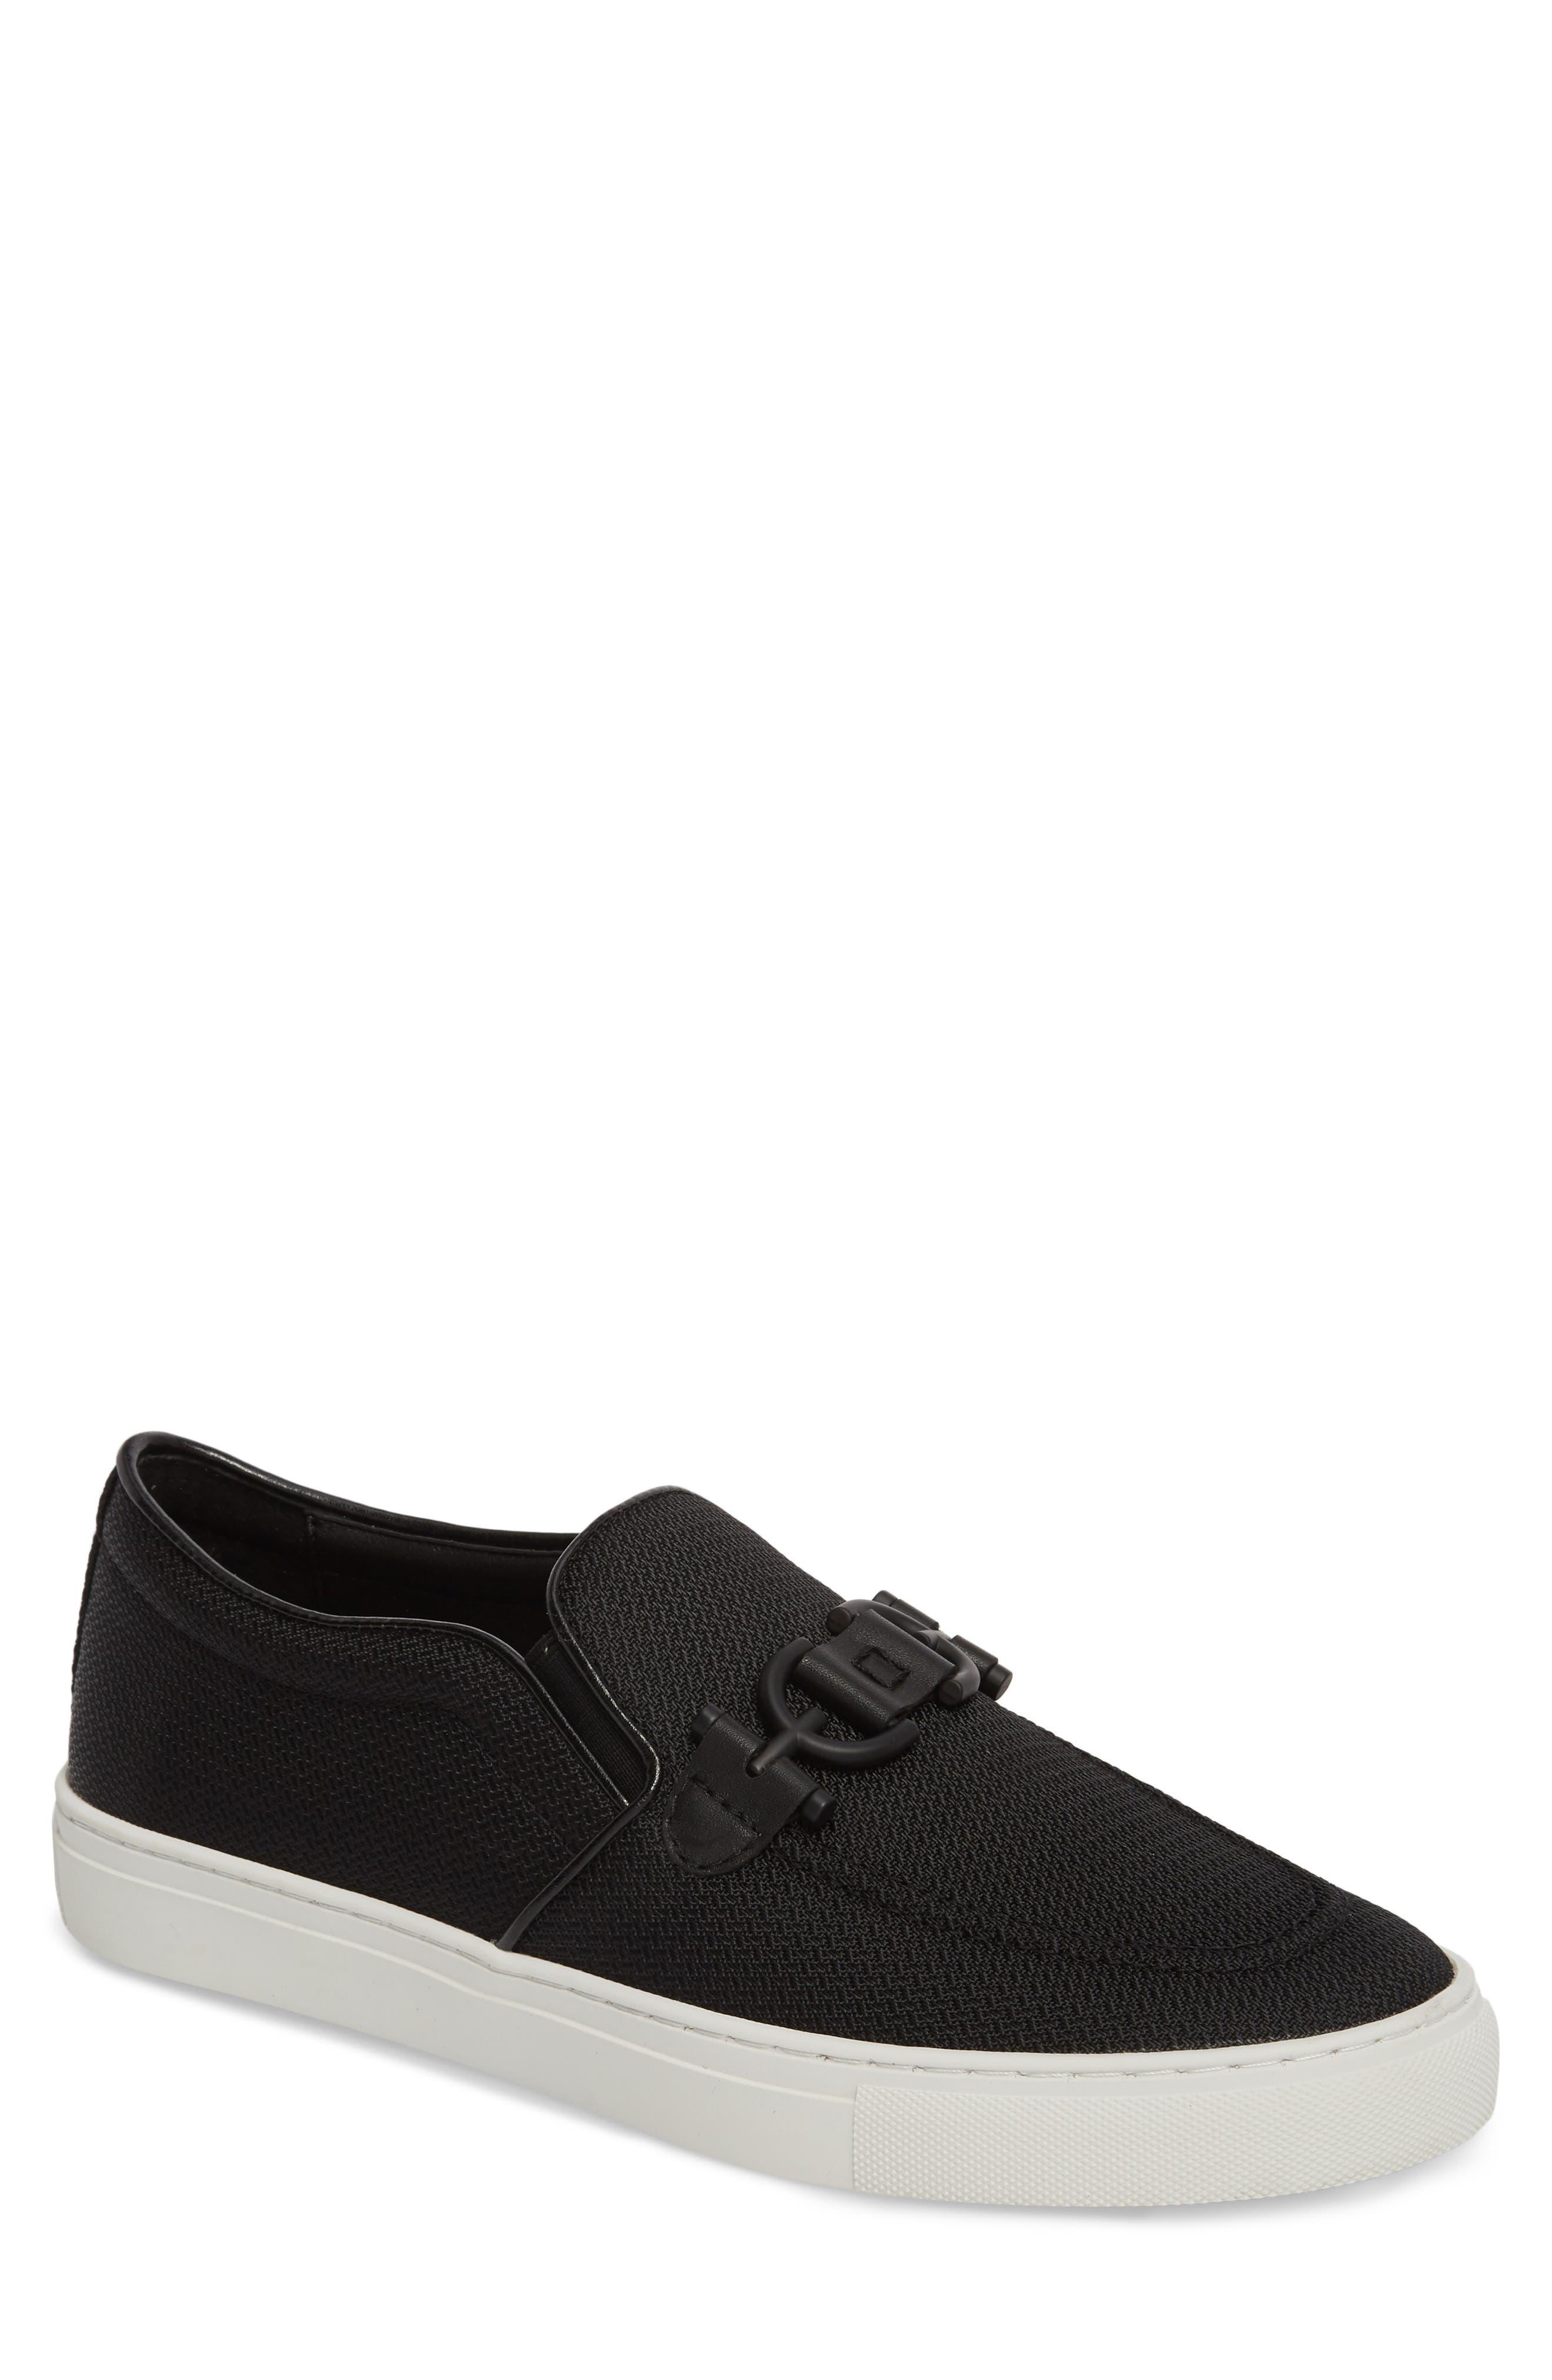 Andor Bit Slip-On Sneaker,                             Main thumbnail 1, color,                             Black Mesh